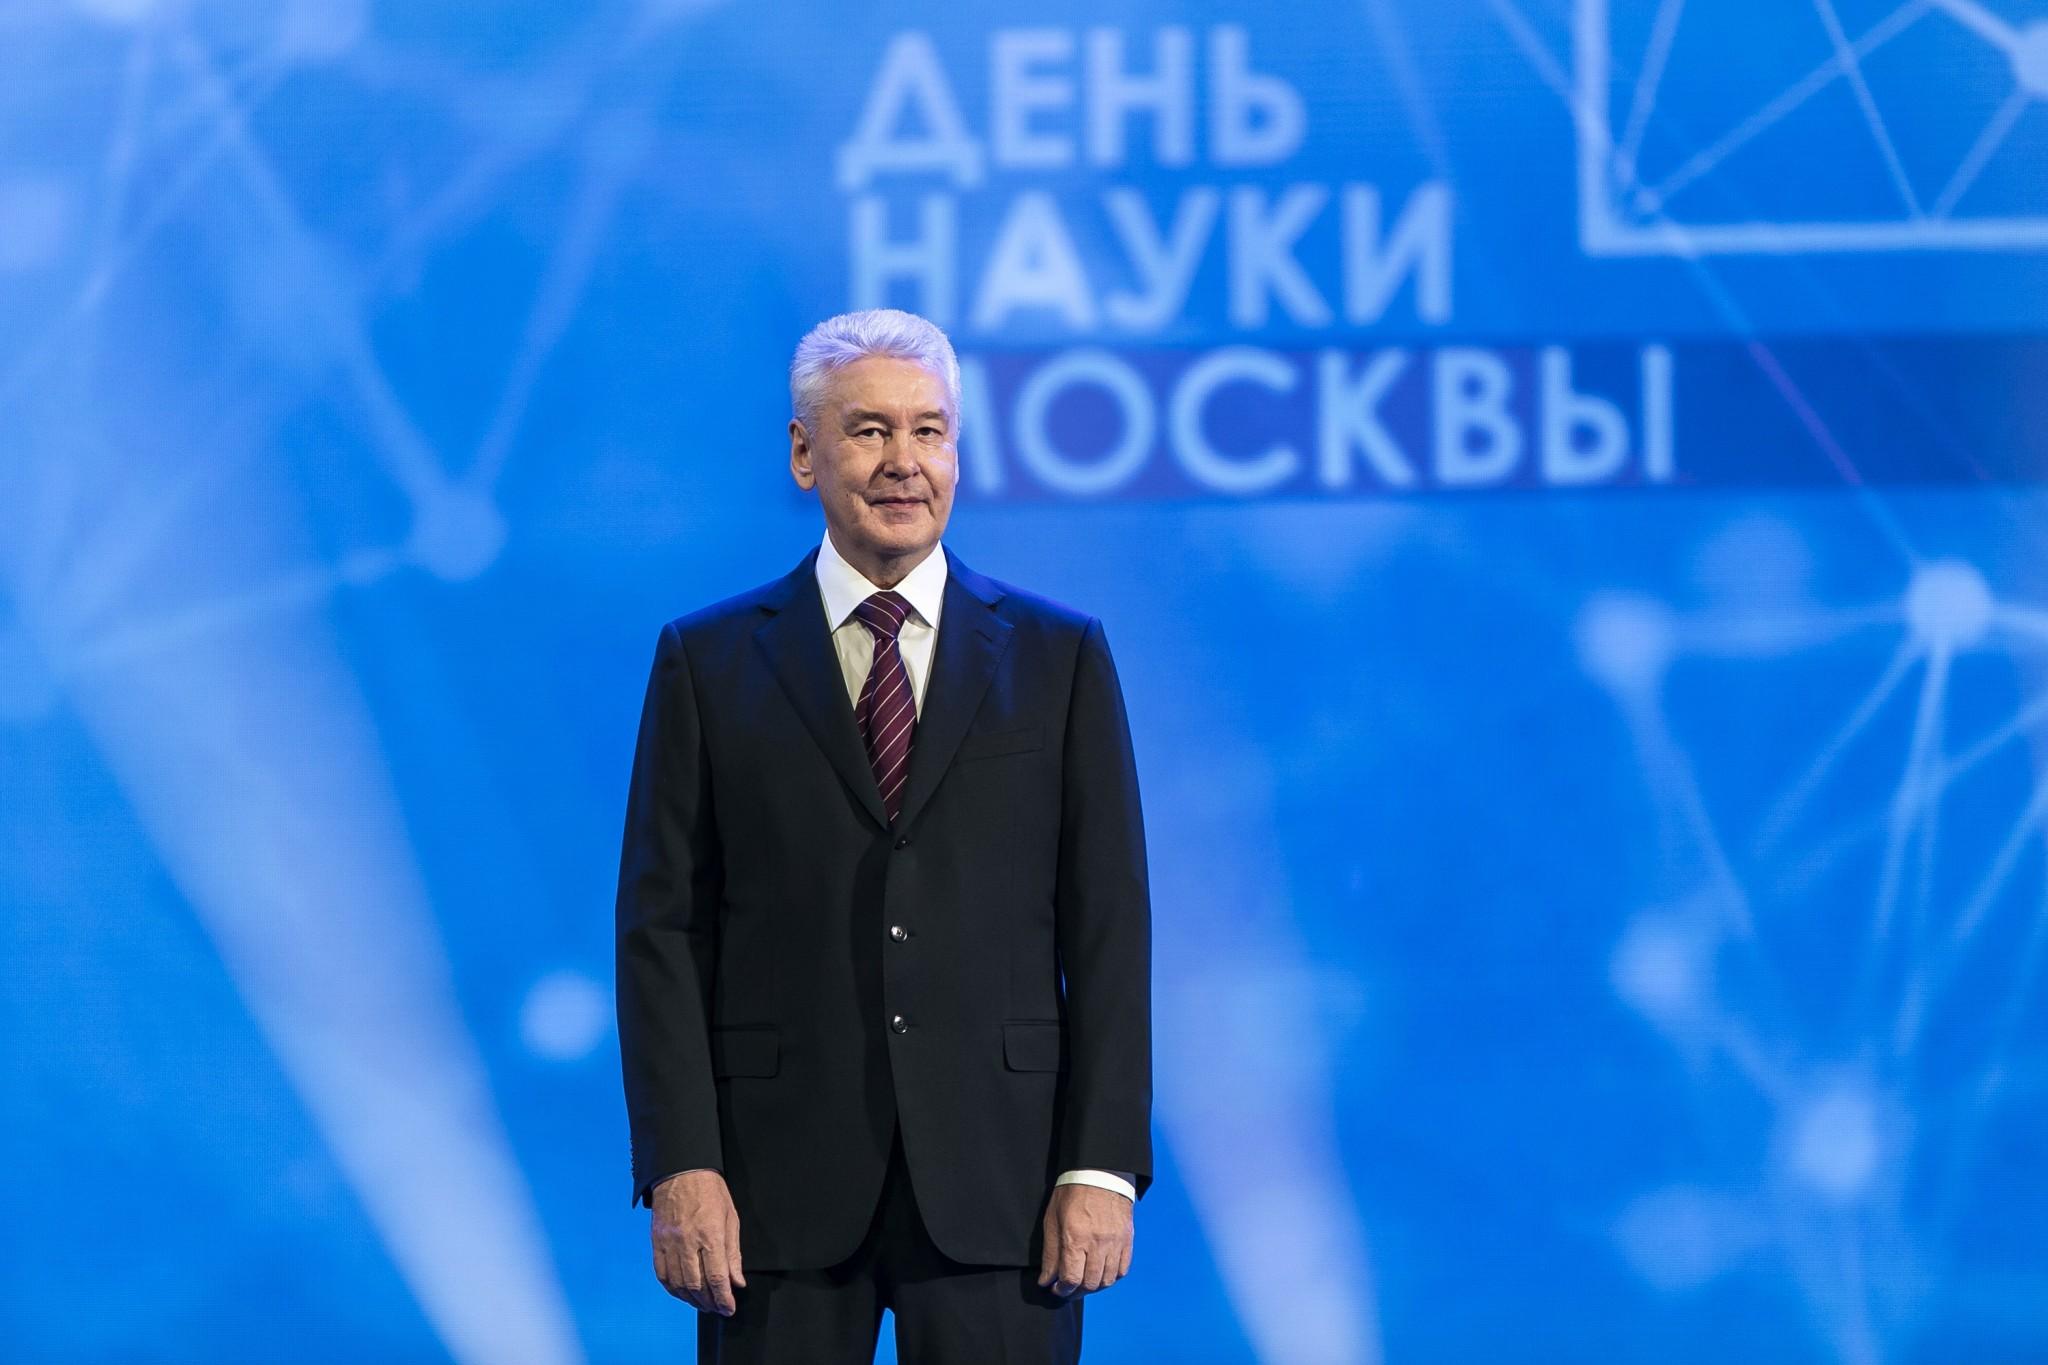 Moscow Mayor Sergei Sobyanin. Photo: DPNN.